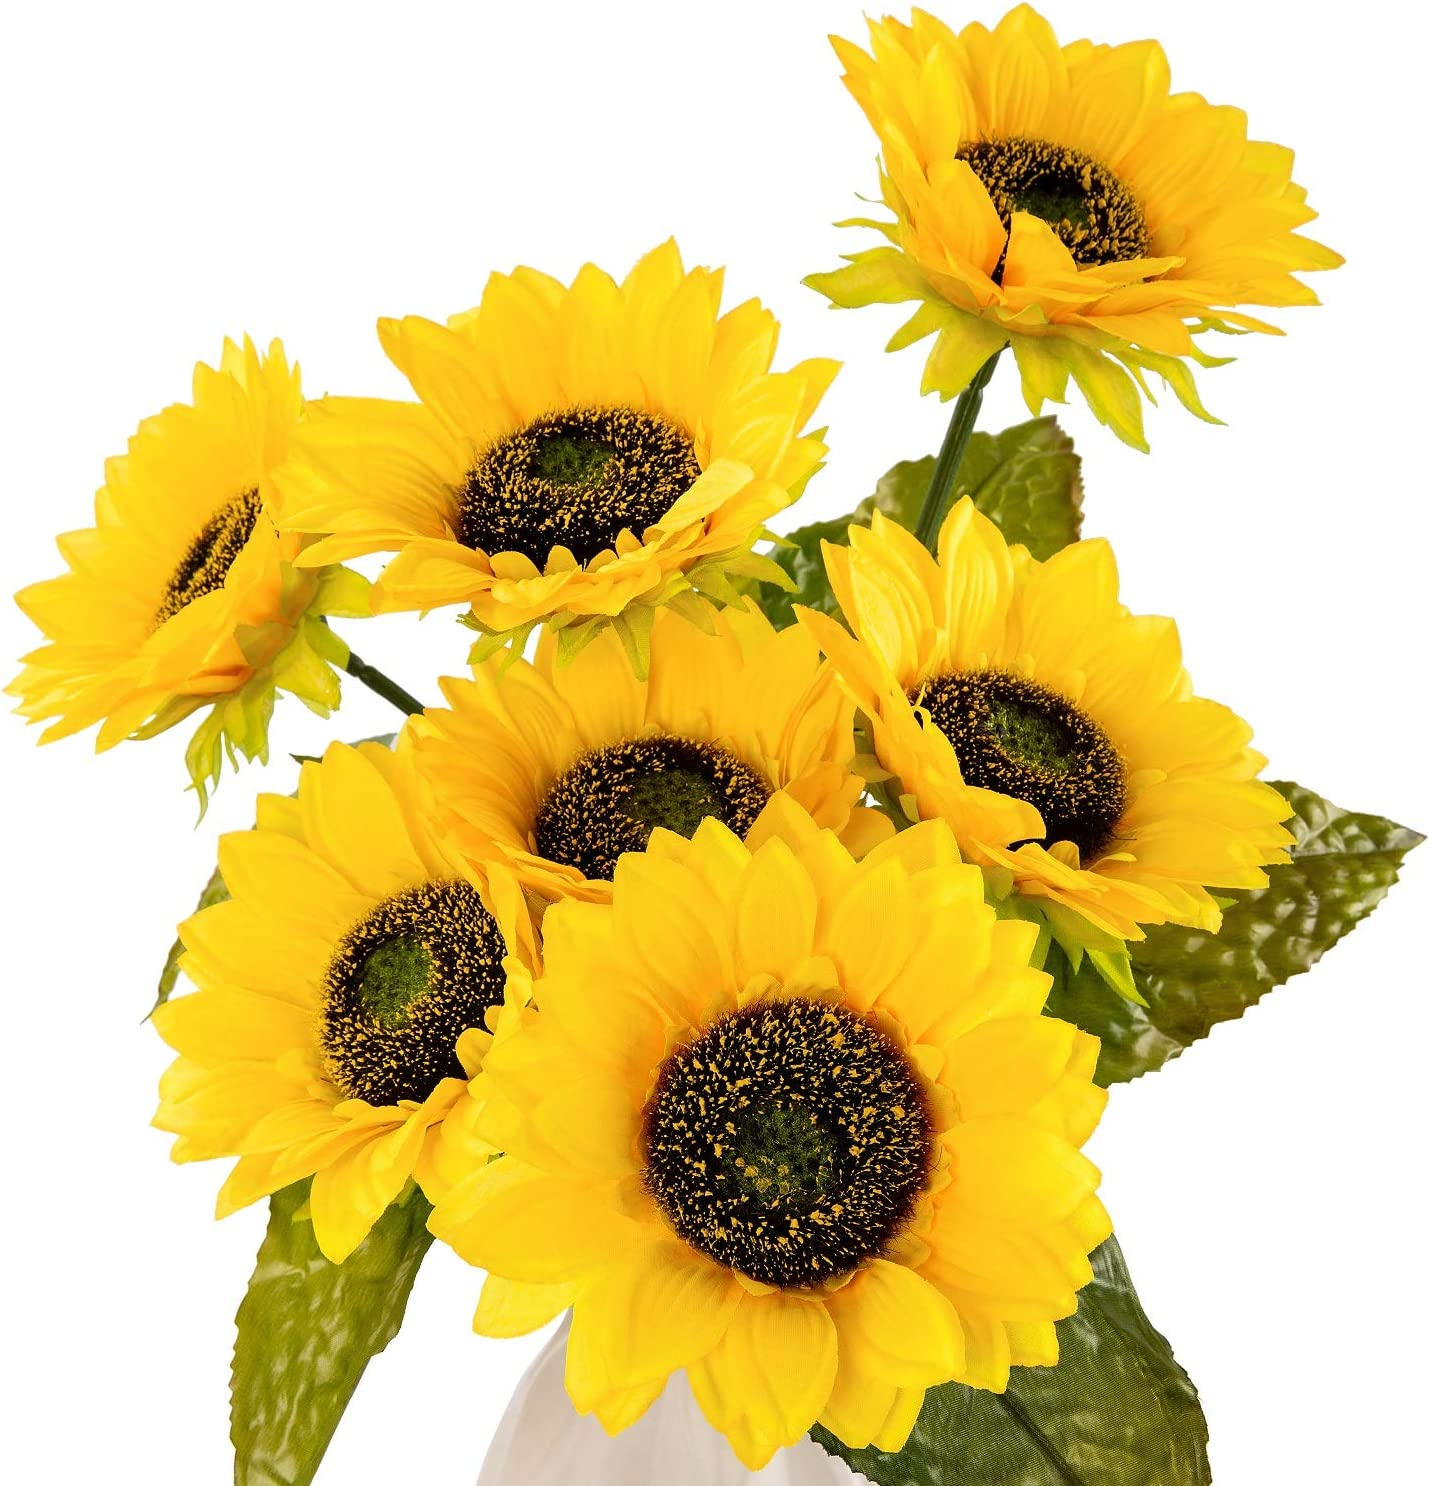 New; Poly Silk; Sunflower Bush; 5 Flower Heads; Approx 9 Long; Sunflower Head 3; Cheerful; FREE SHIPPING !!!